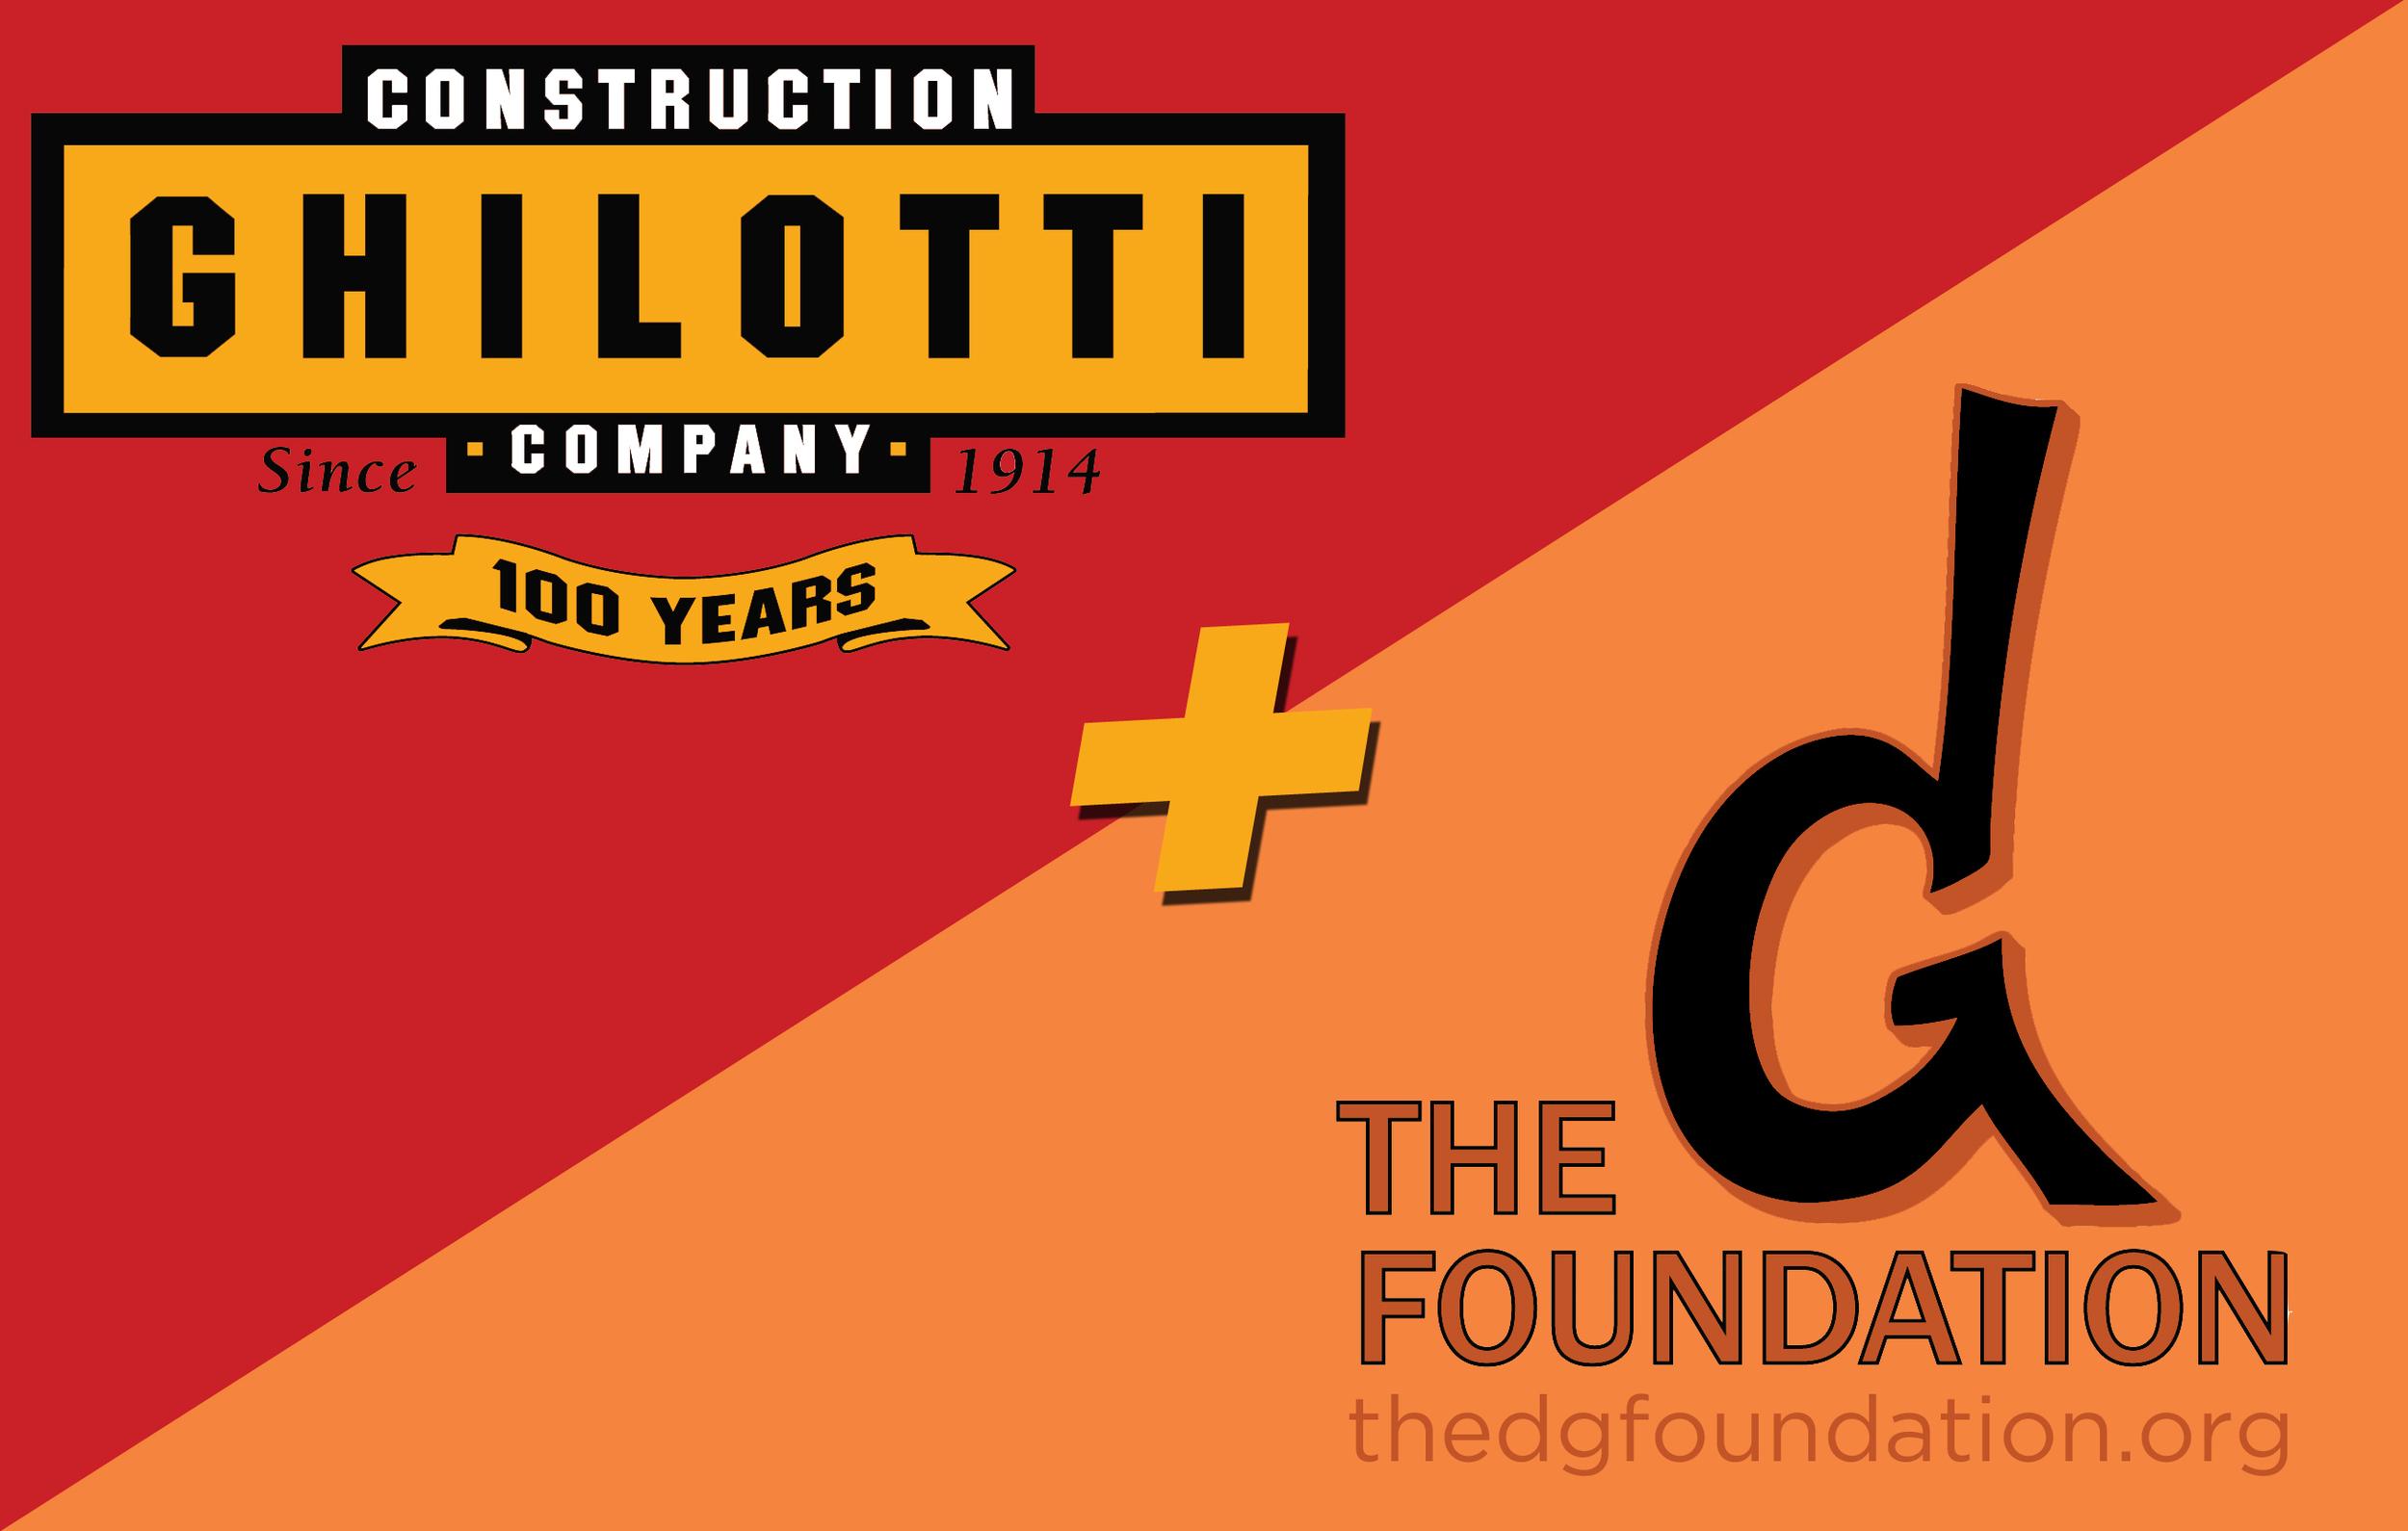 DG Foundation Ghilotti Construction